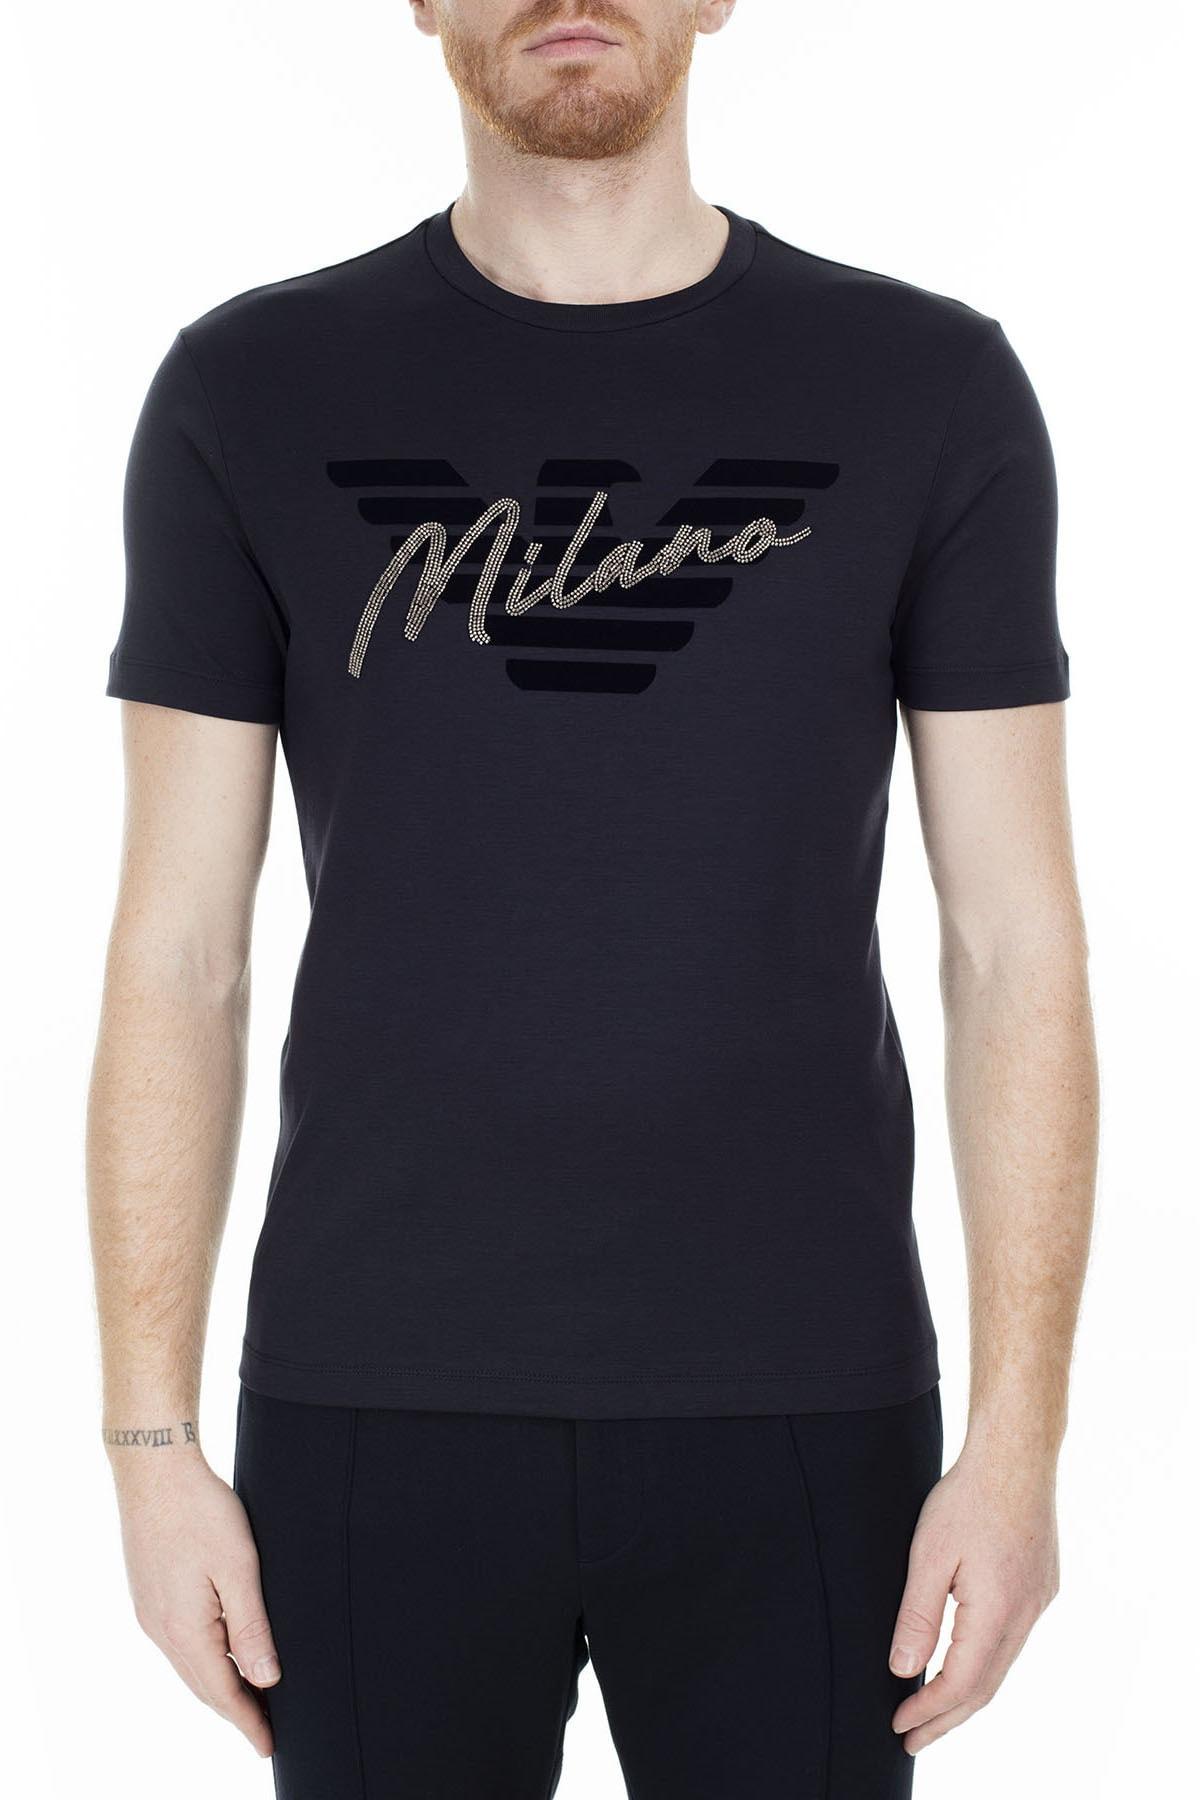 Emporio Armani T Shirt Erkek T Shirt S 6G1Tf0 1Jprz 0922 S 6G1TF0 1JPRZ 0922